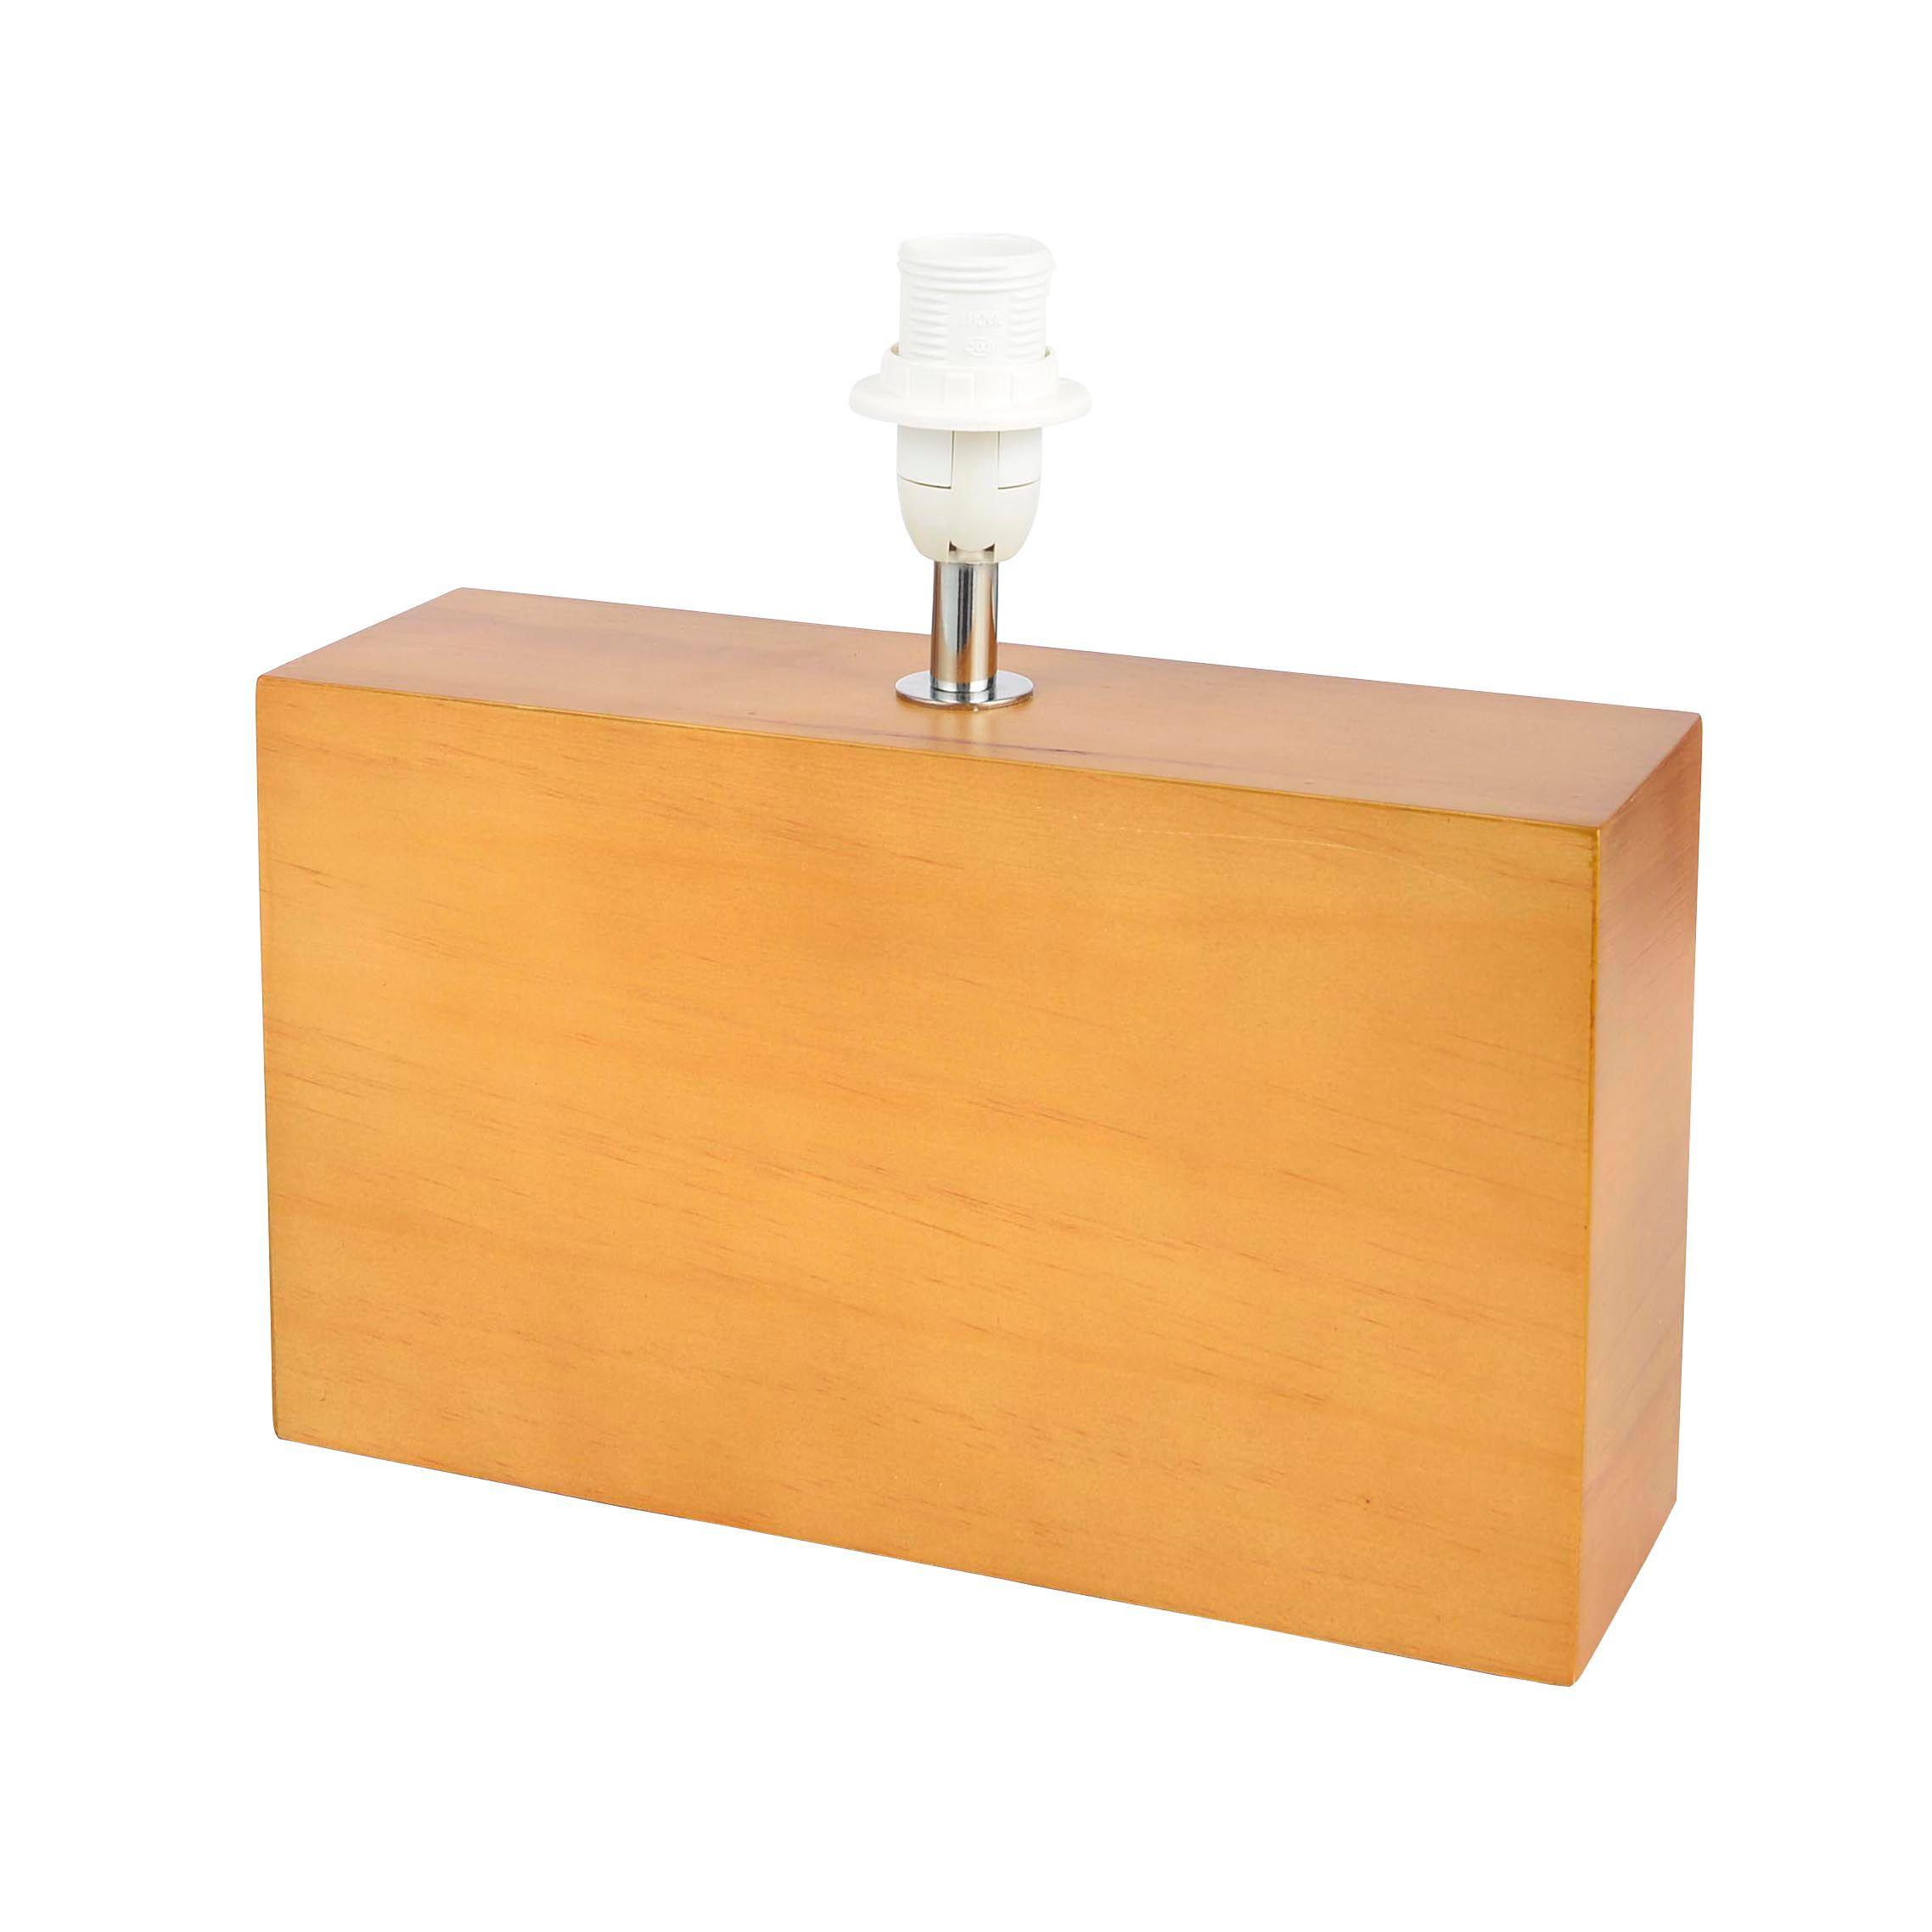 hector rectangle oak effect table lamp departments diy at b q. Black Bedroom Furniture Sets. Home Design Ideas